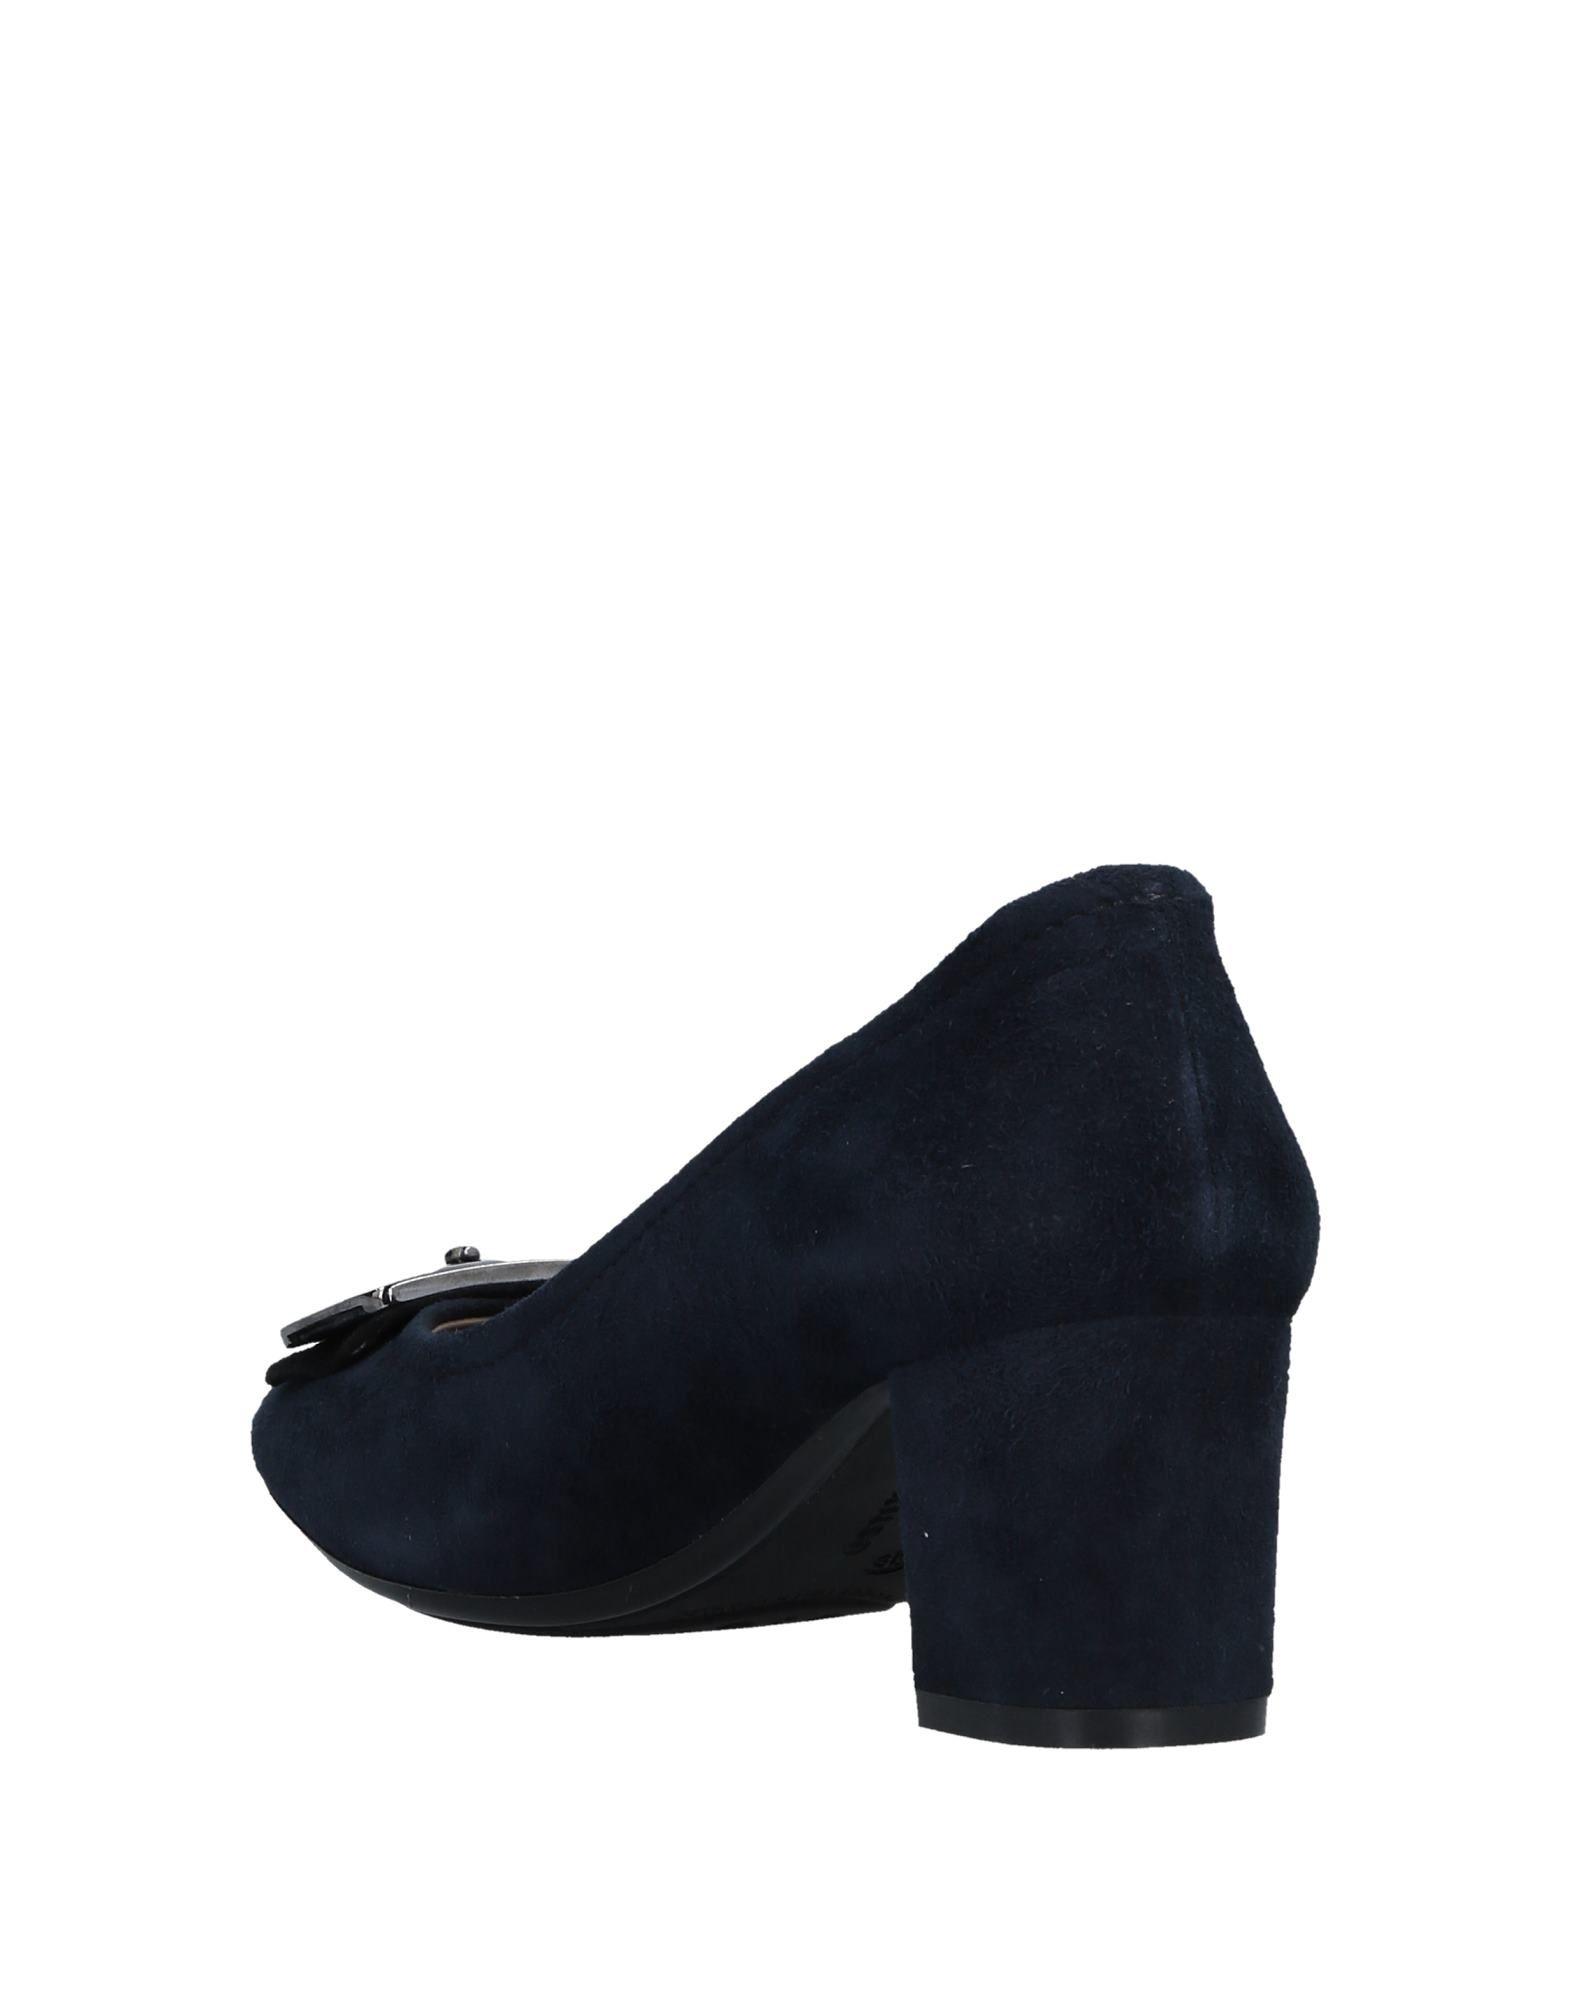 Melluso Gute Pumps Damen  11534463RE Gute Melluso Qualität beliebte Schuhe 15a2c4